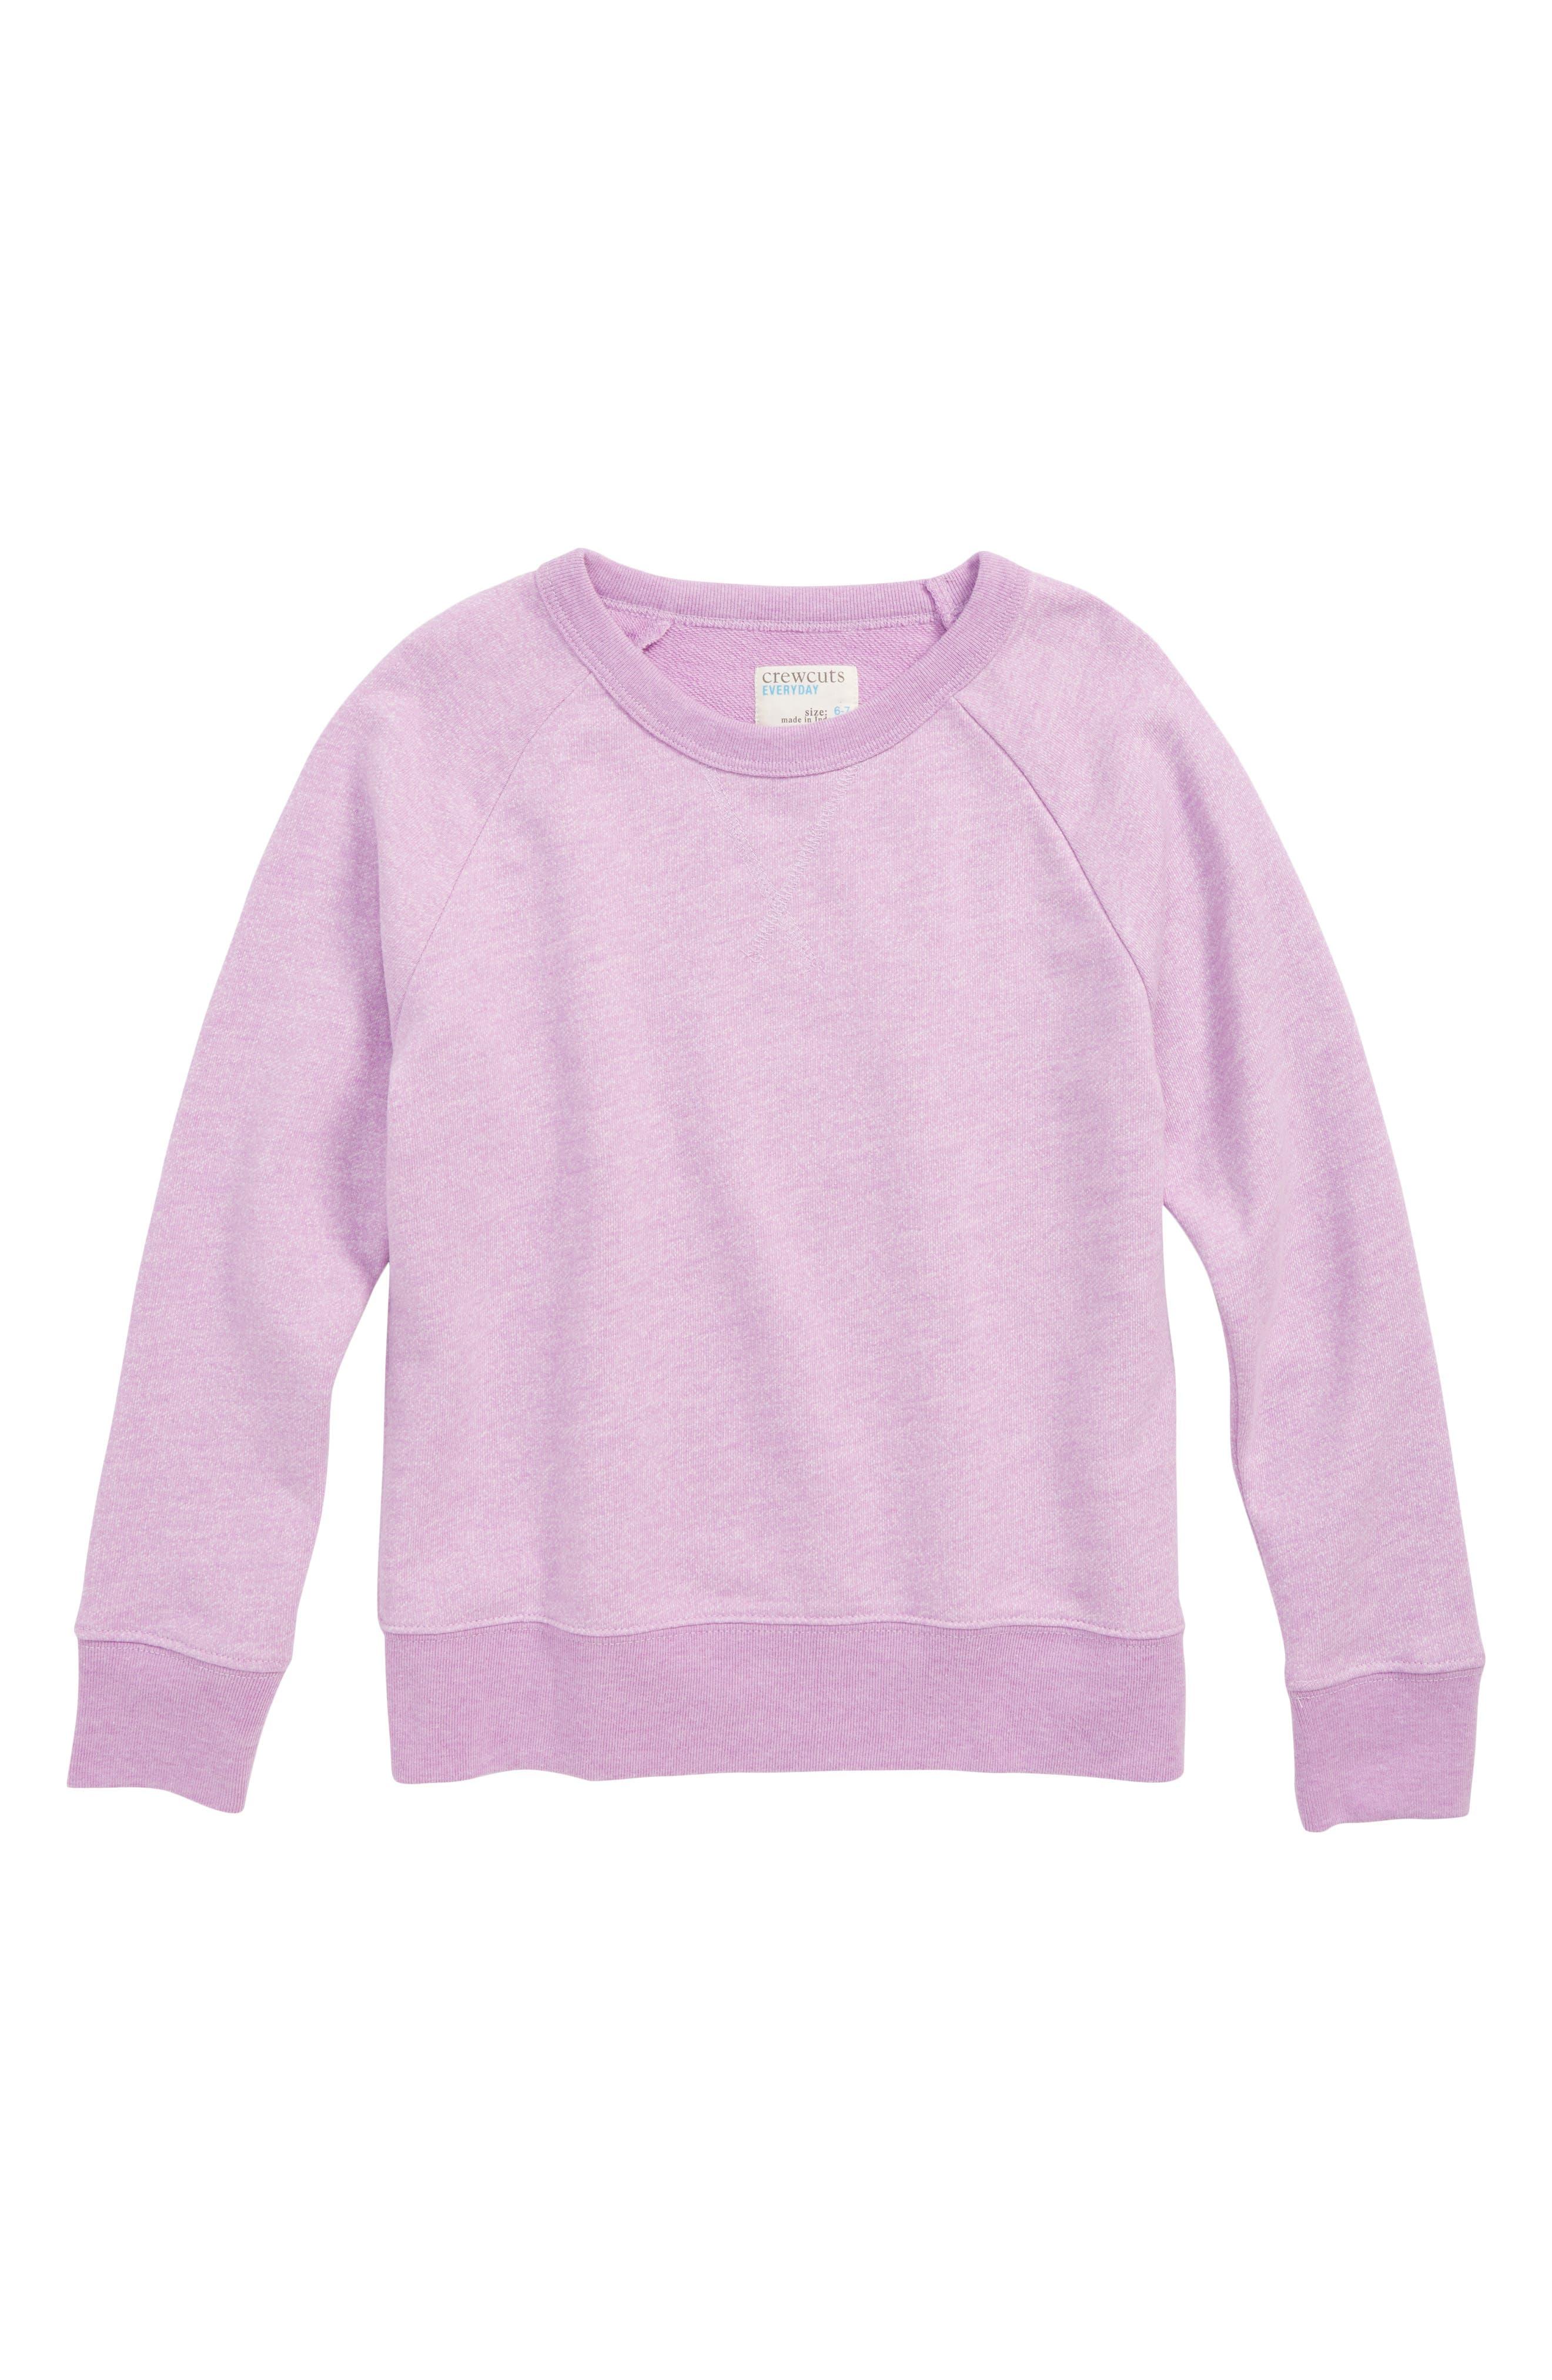 Crewneck Sweatshirt,                         Main,                         color, SUNDRENCHED POOL